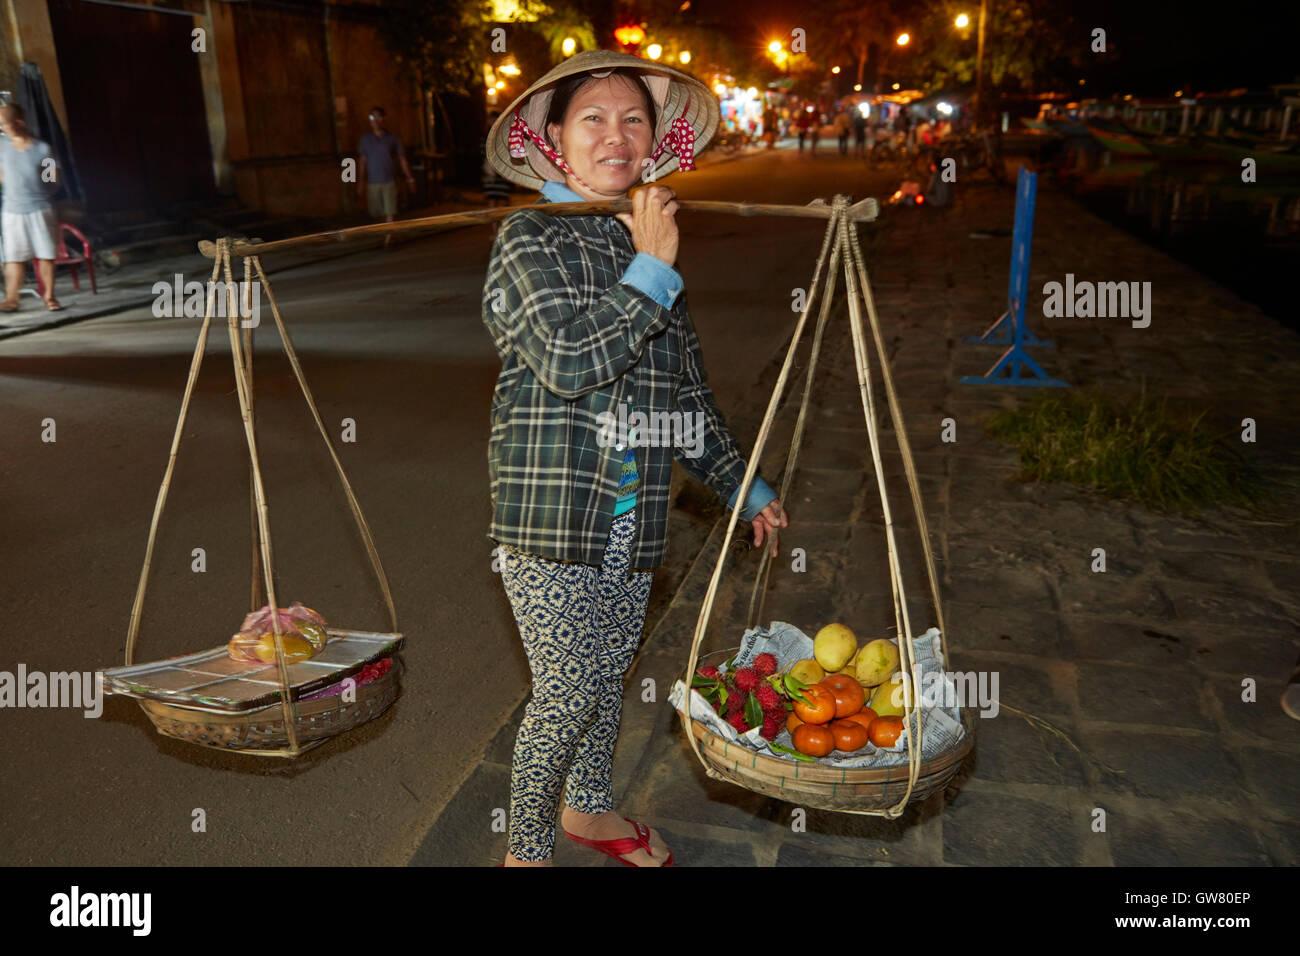 Vietnamese woman carrying produce on a bamboo yoke, Hoi An (UNESCO World Heritage Site), Vietnam - Stock Image